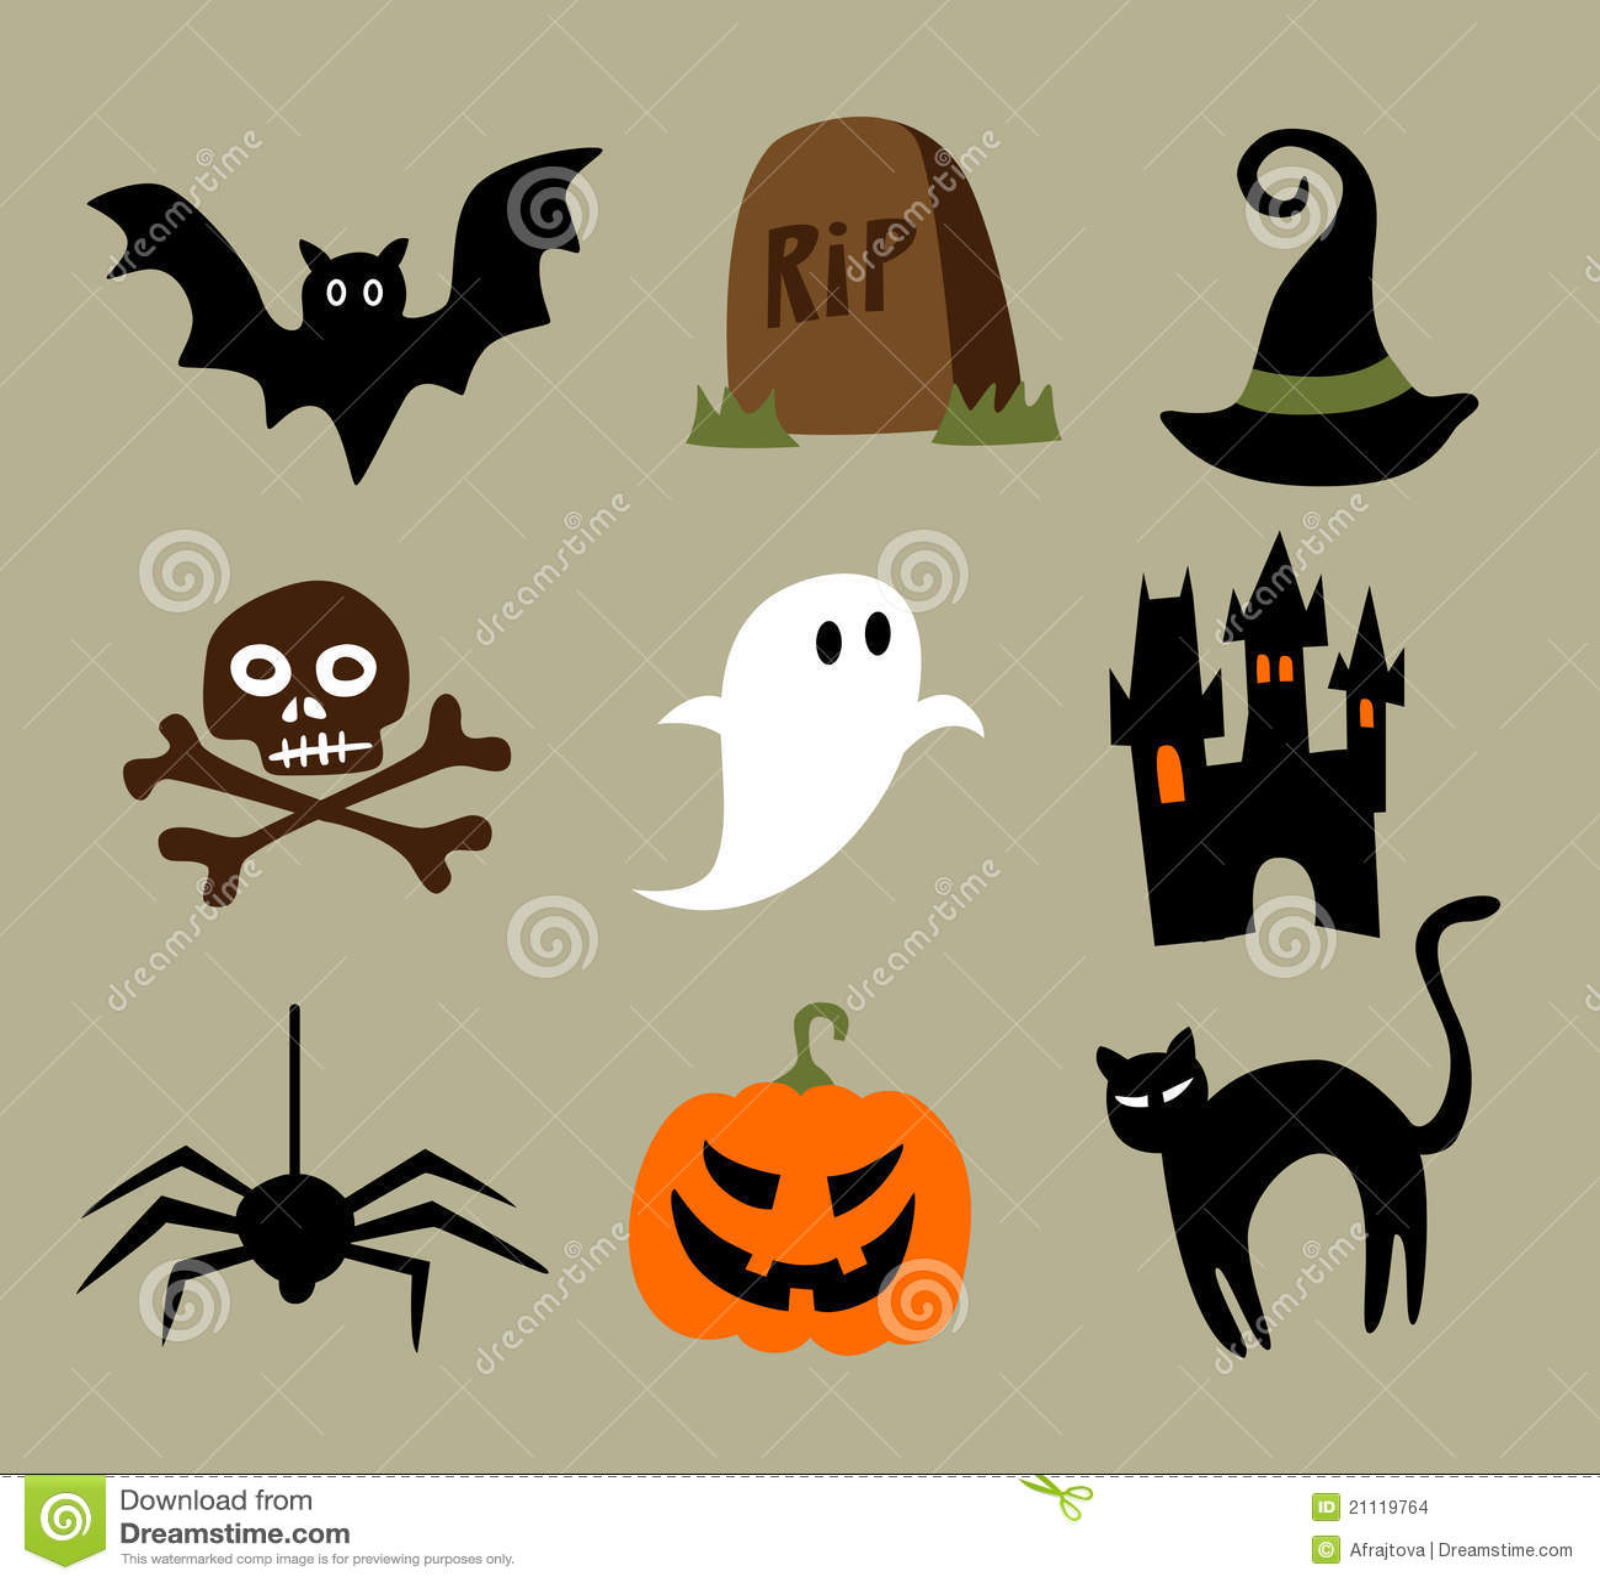 Halloween Cartoons Stock Vector. Image Of Grave, Graphic